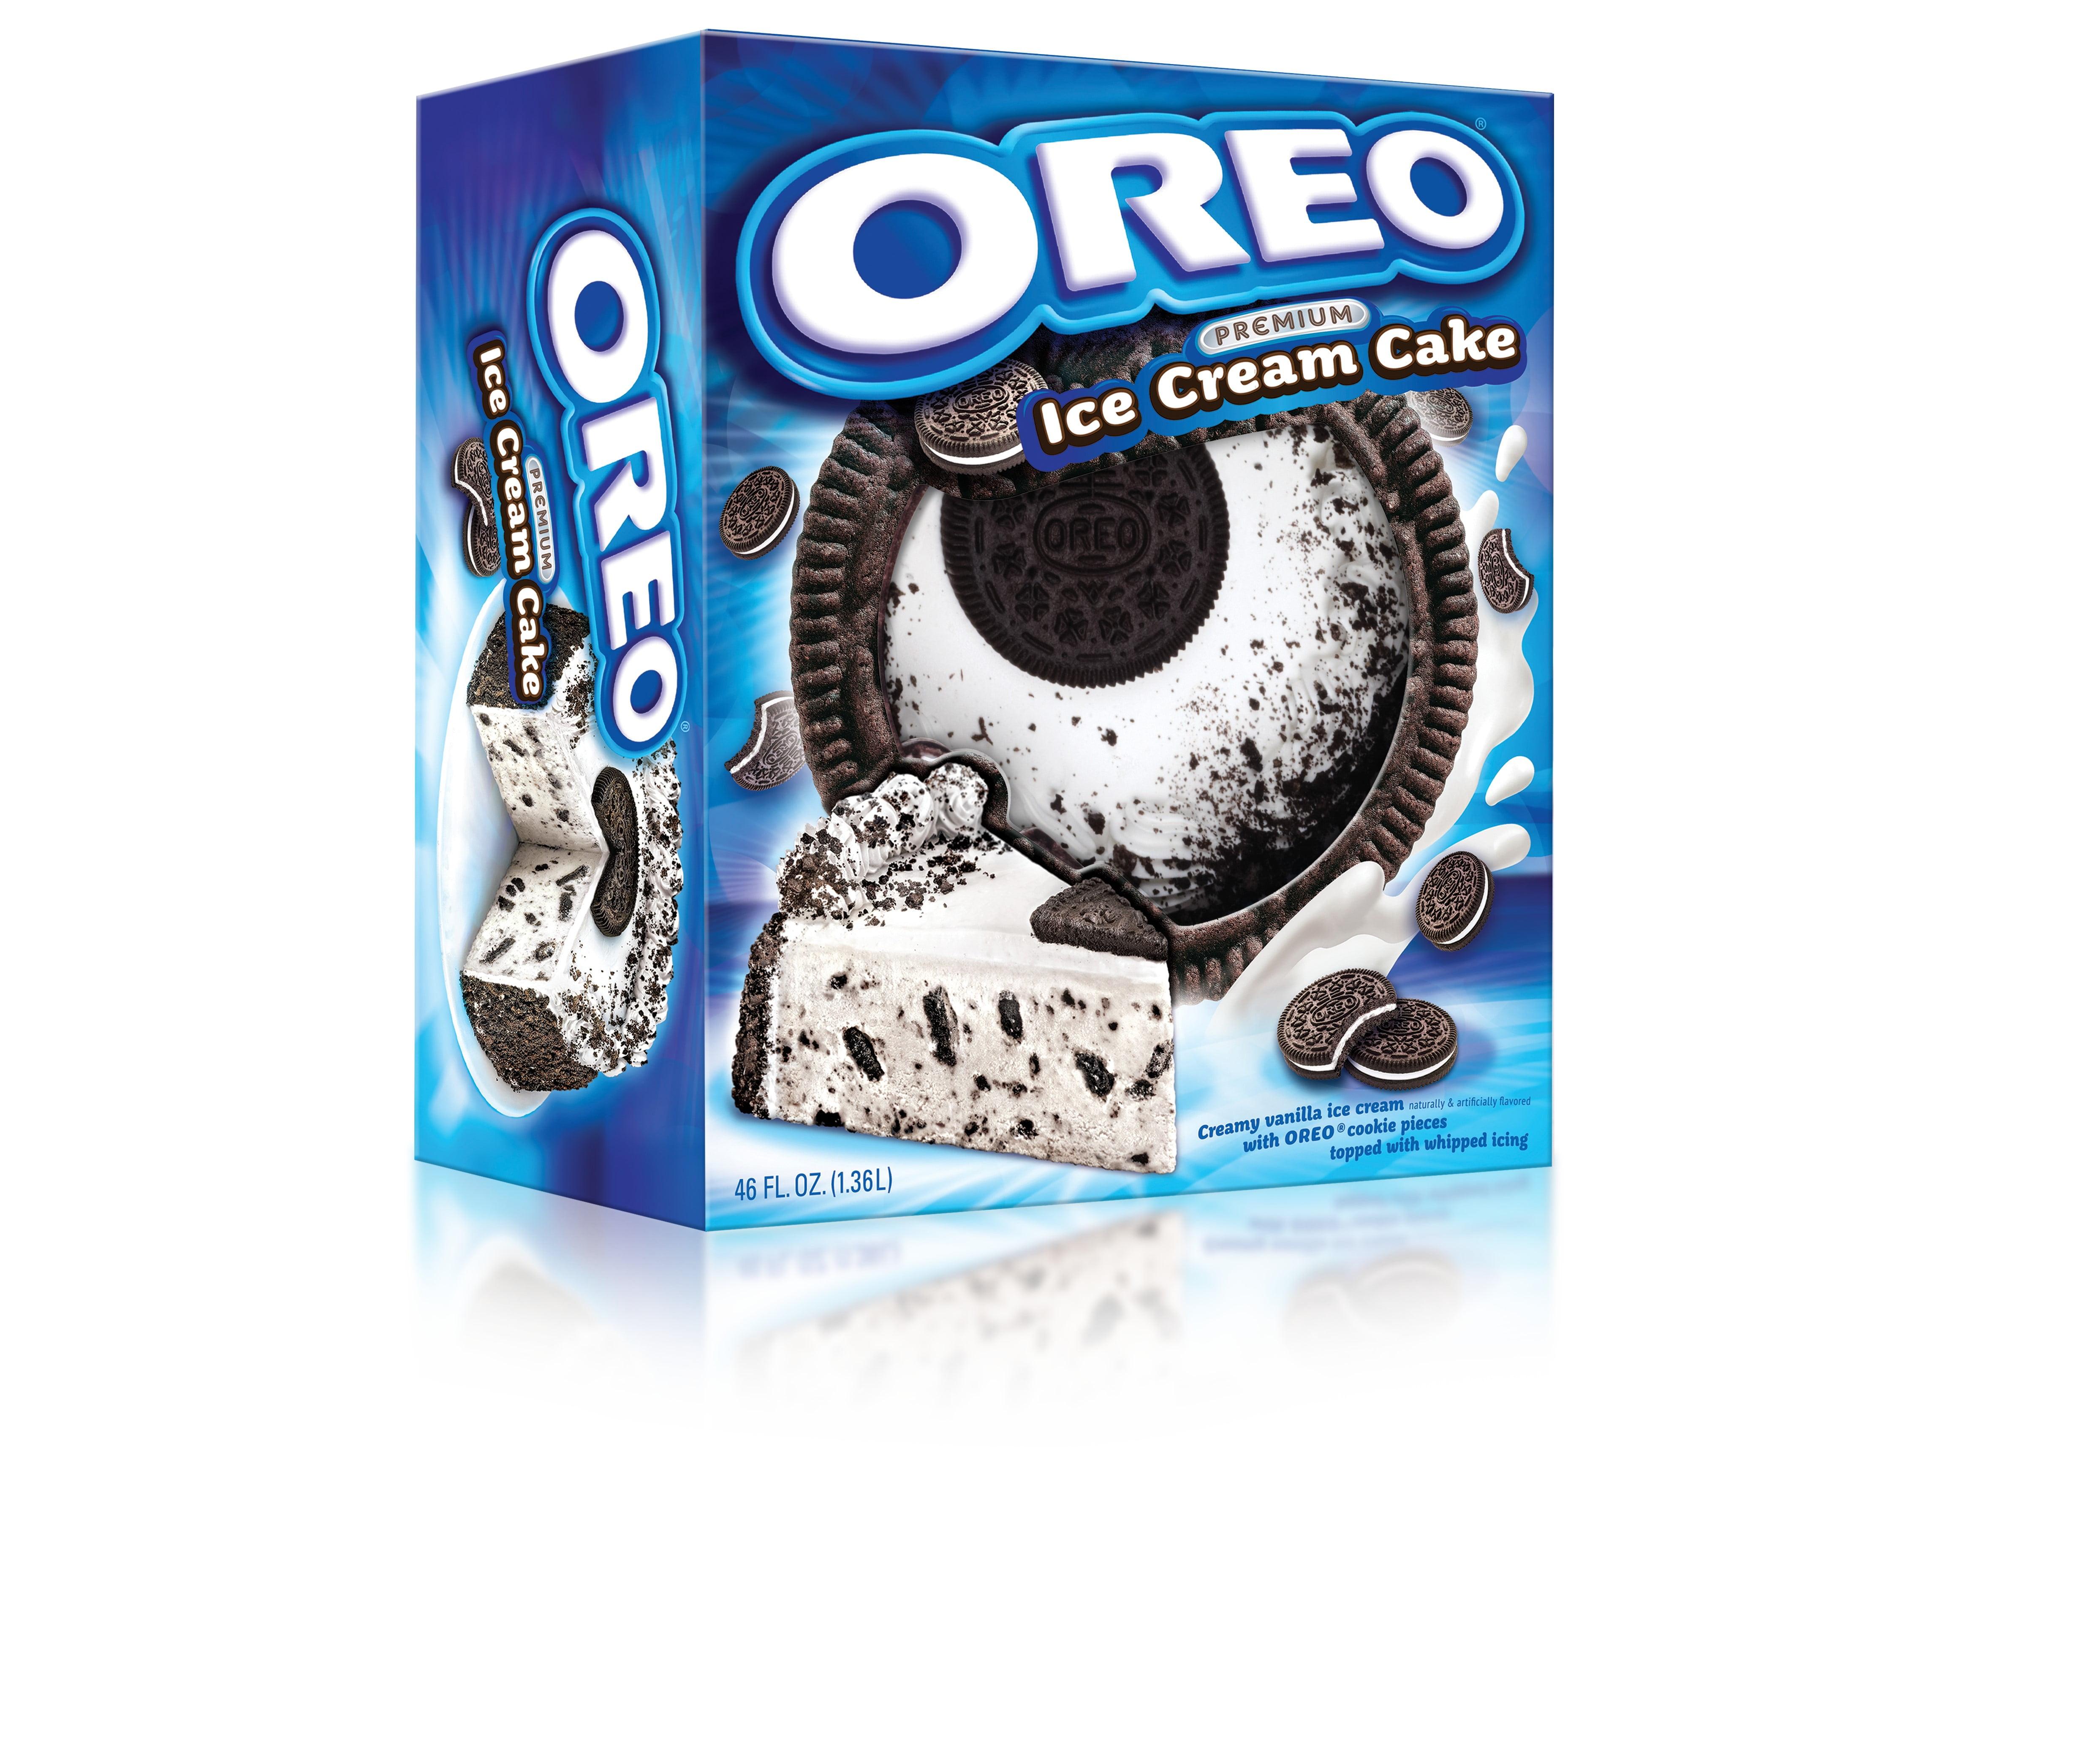 Oreo Premium Ice Cream Cake Made With Oreo Cookies And